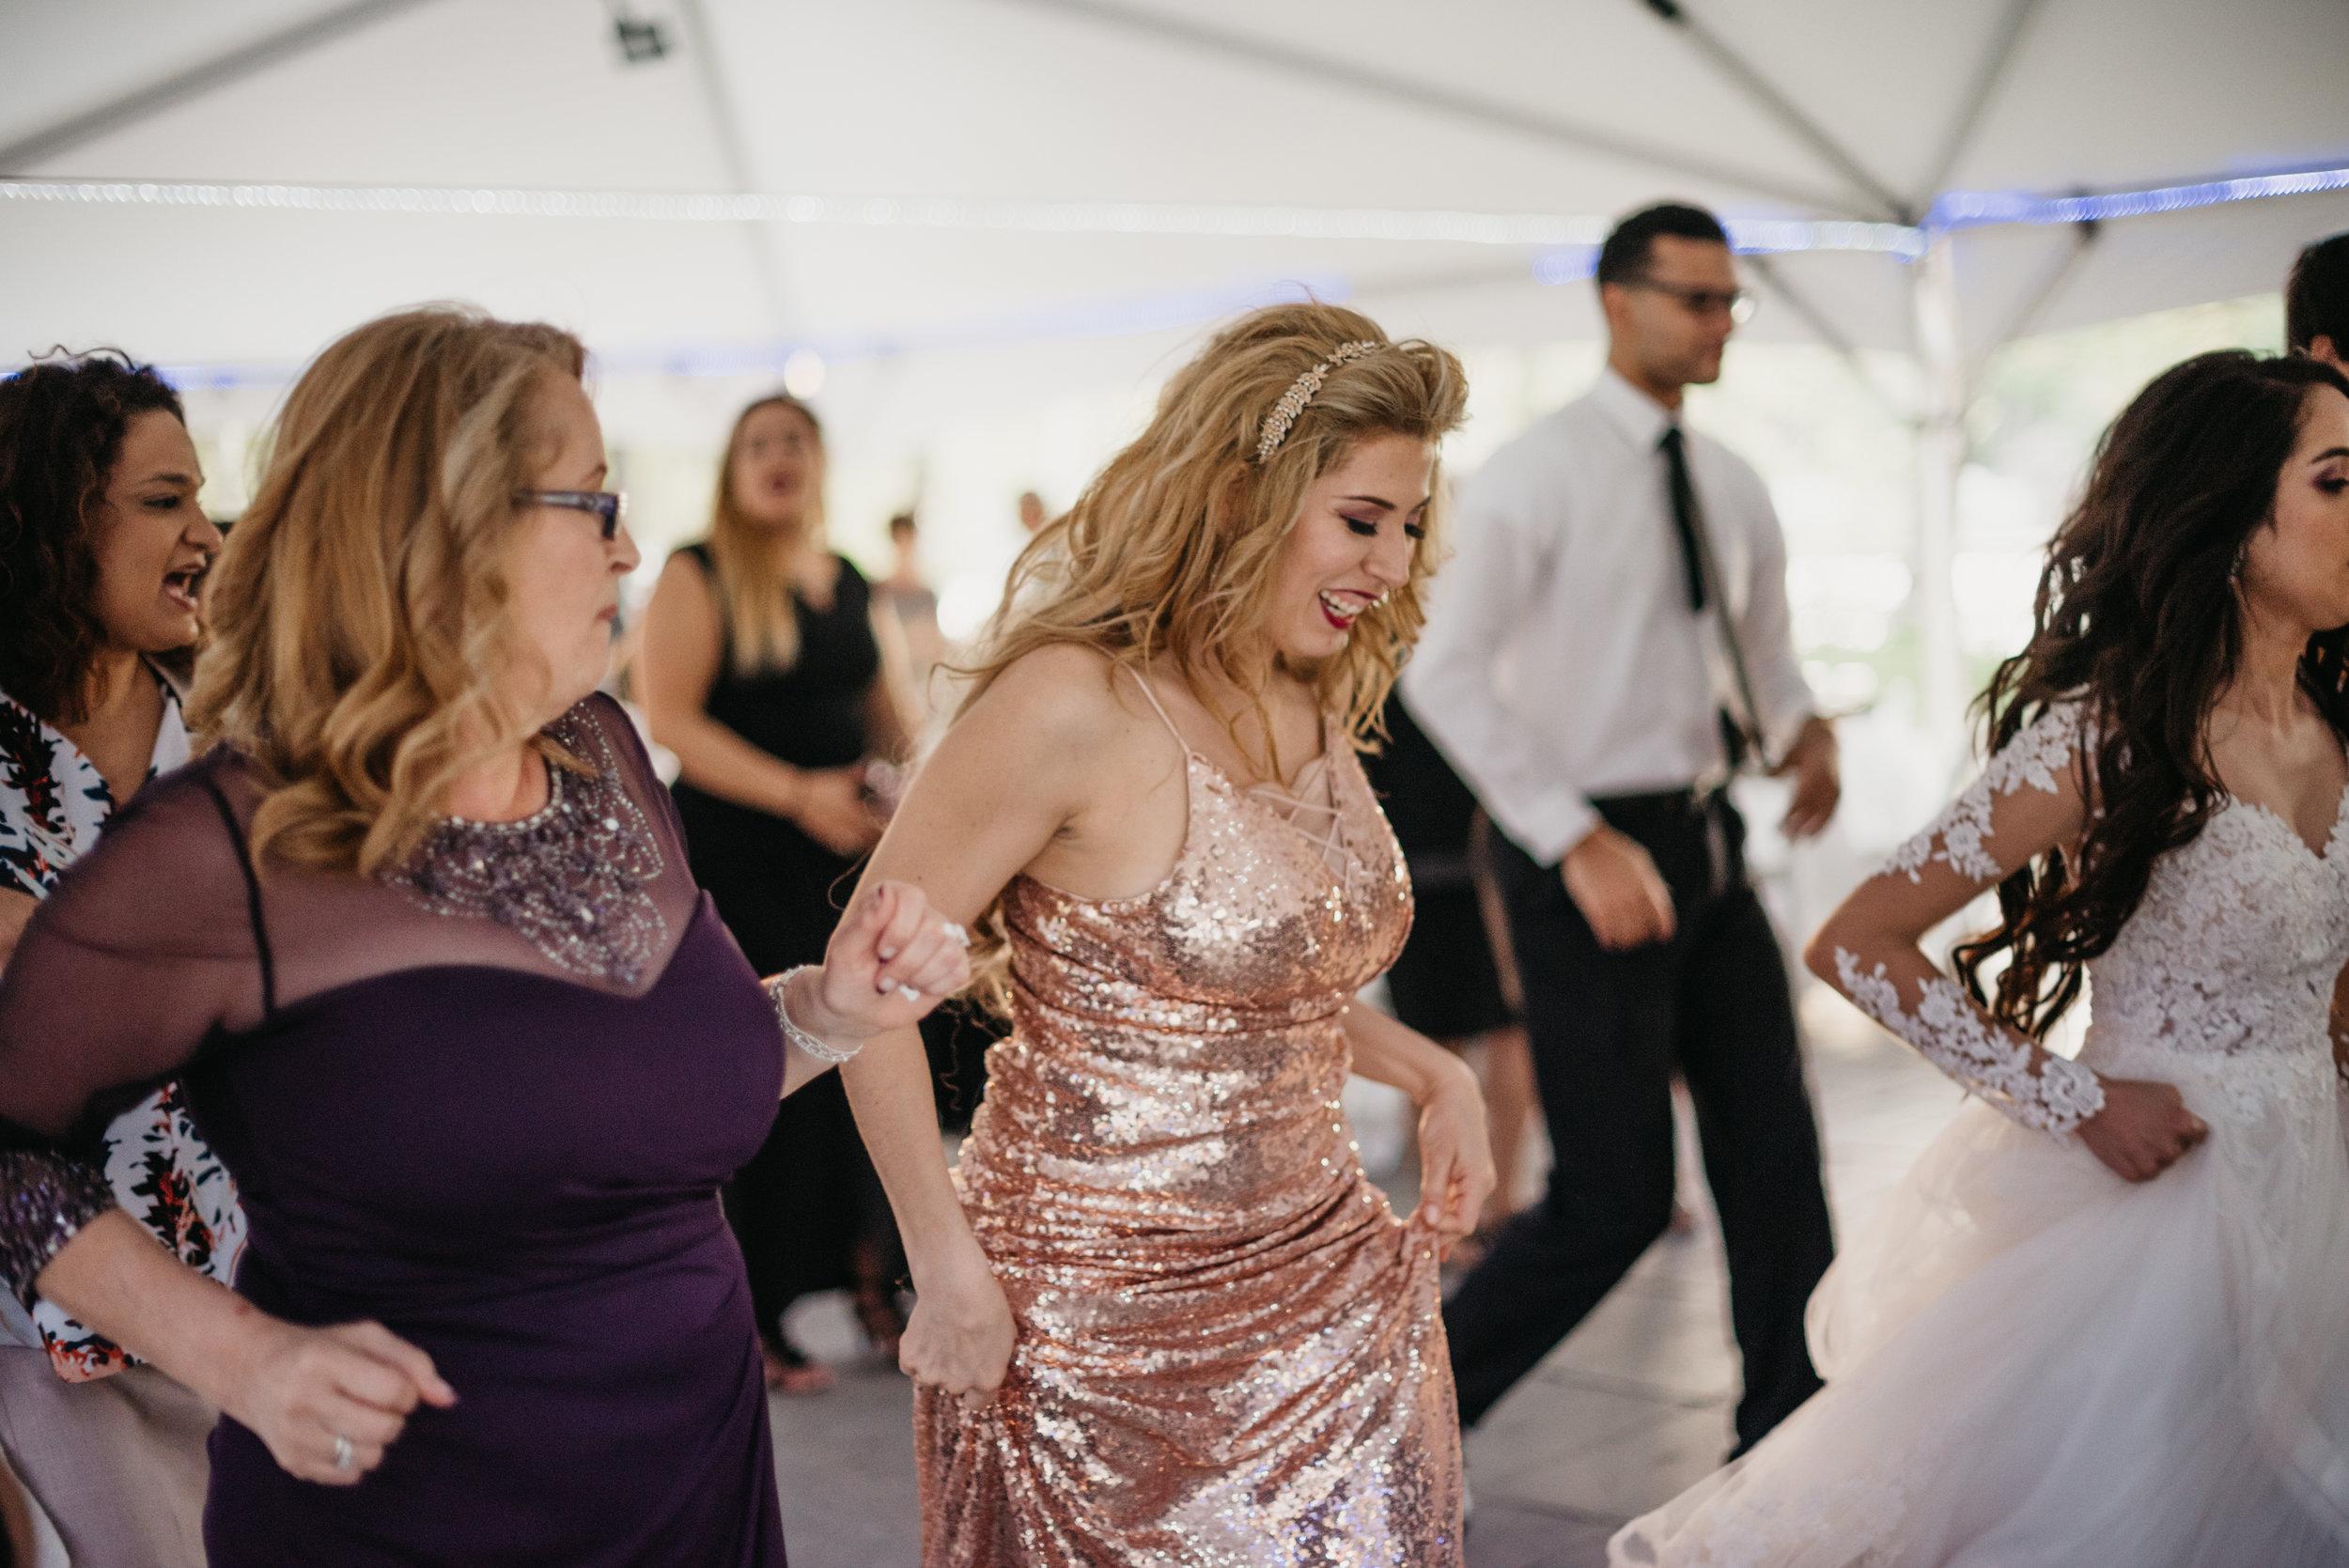 Barch-Massachusetts-Lakeside Tent Wedding-Western Massachusetts Wedding Photographer-03570.jpg